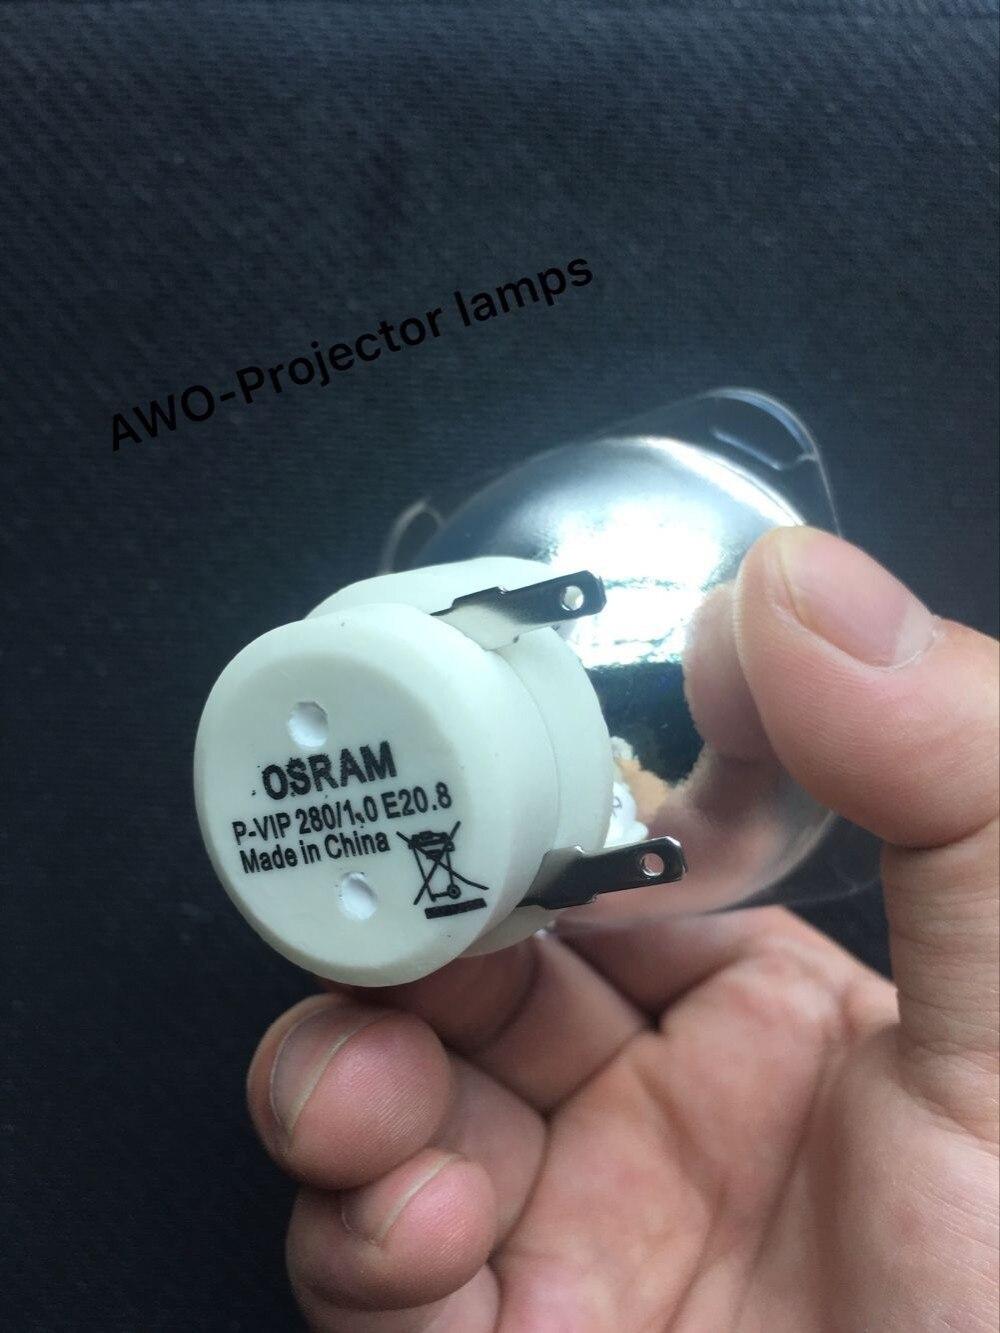 10pc/lot 280W Lamp OSRAM SIRIUS HRI 280W Moving head beam light bulb and MSD Platinum 10R P-VIP 280 W lamp original msd platinum 10r 280w 10r moving head bulb 10r beam lamps for osram